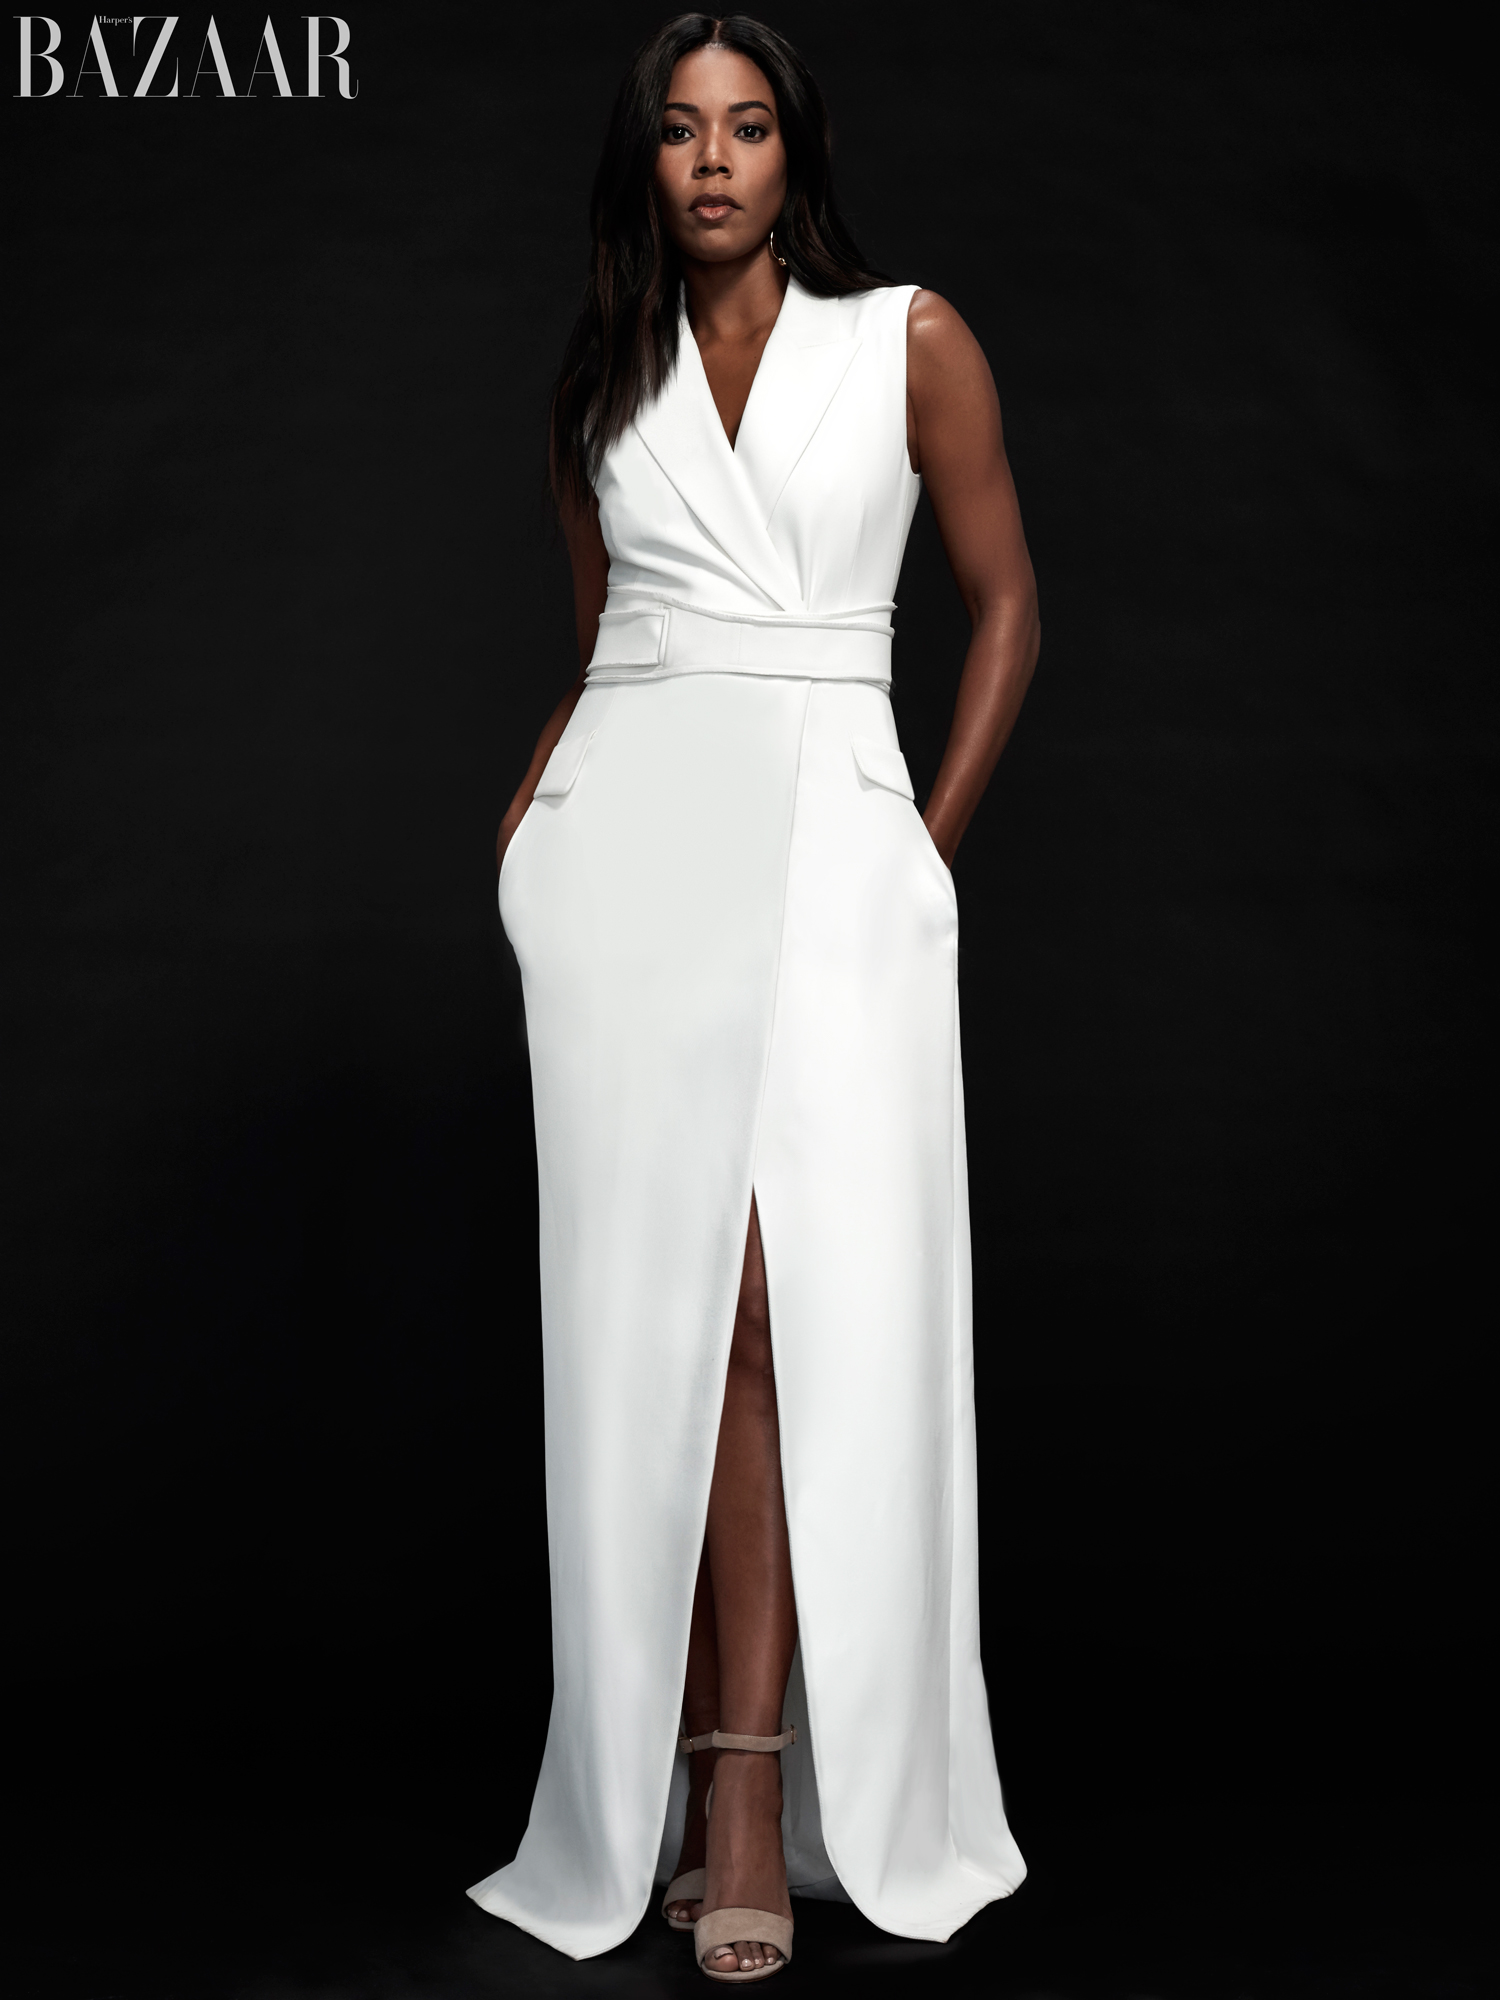 Gabrielle Union For Harper's Bazaar